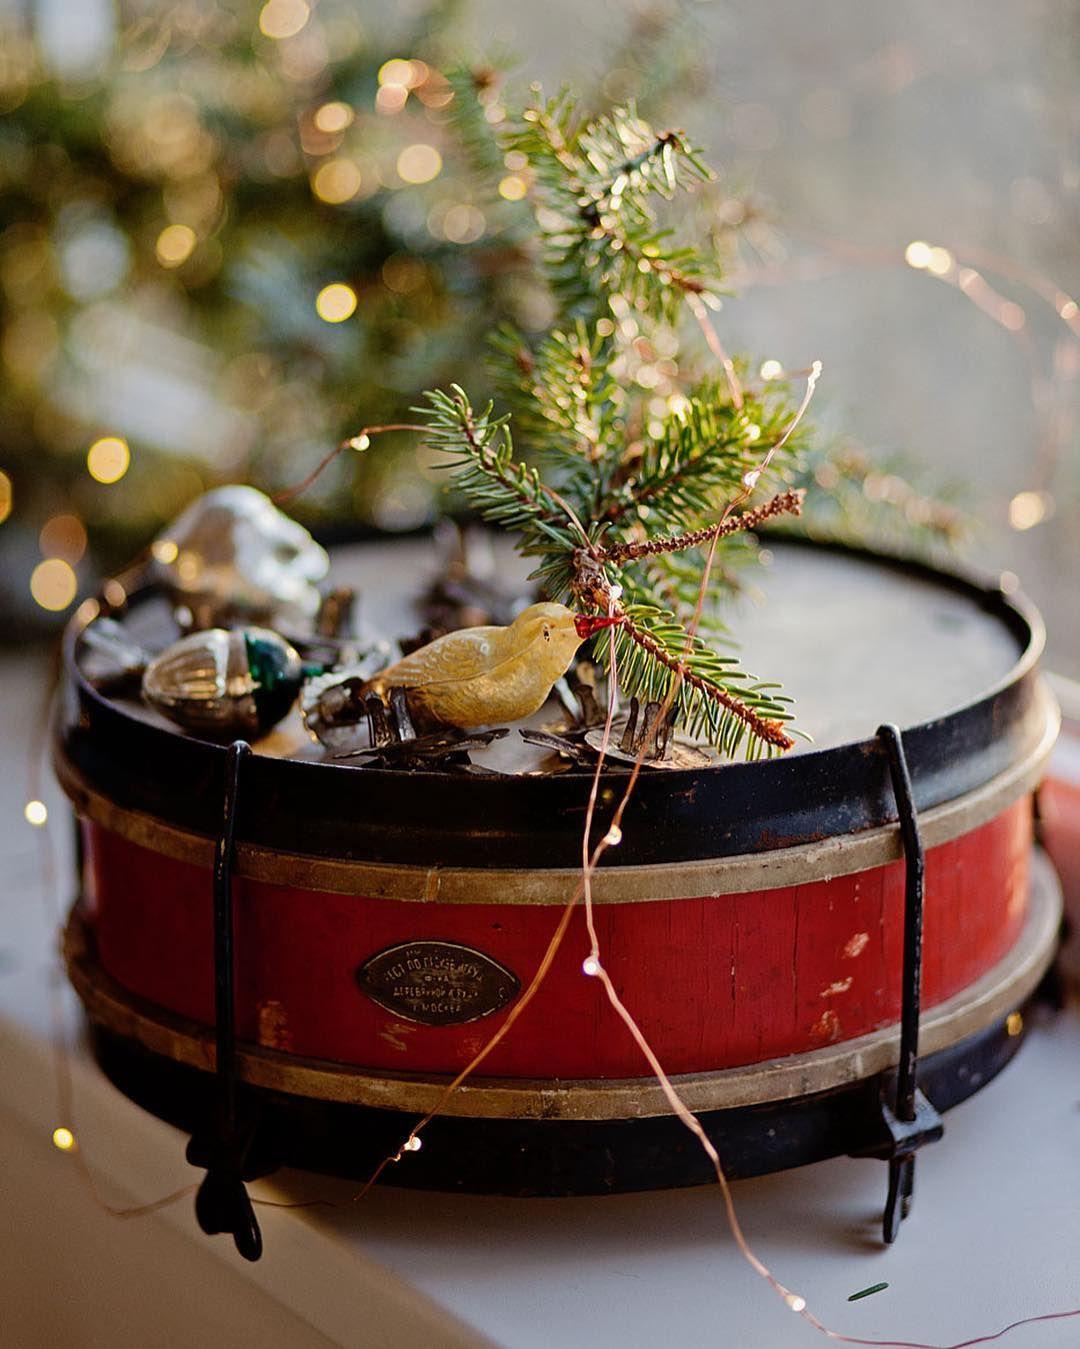 #allthebeautifulthings #newyear #christmastime #drum #oldchristmastreetoys #sovietchristmastoys